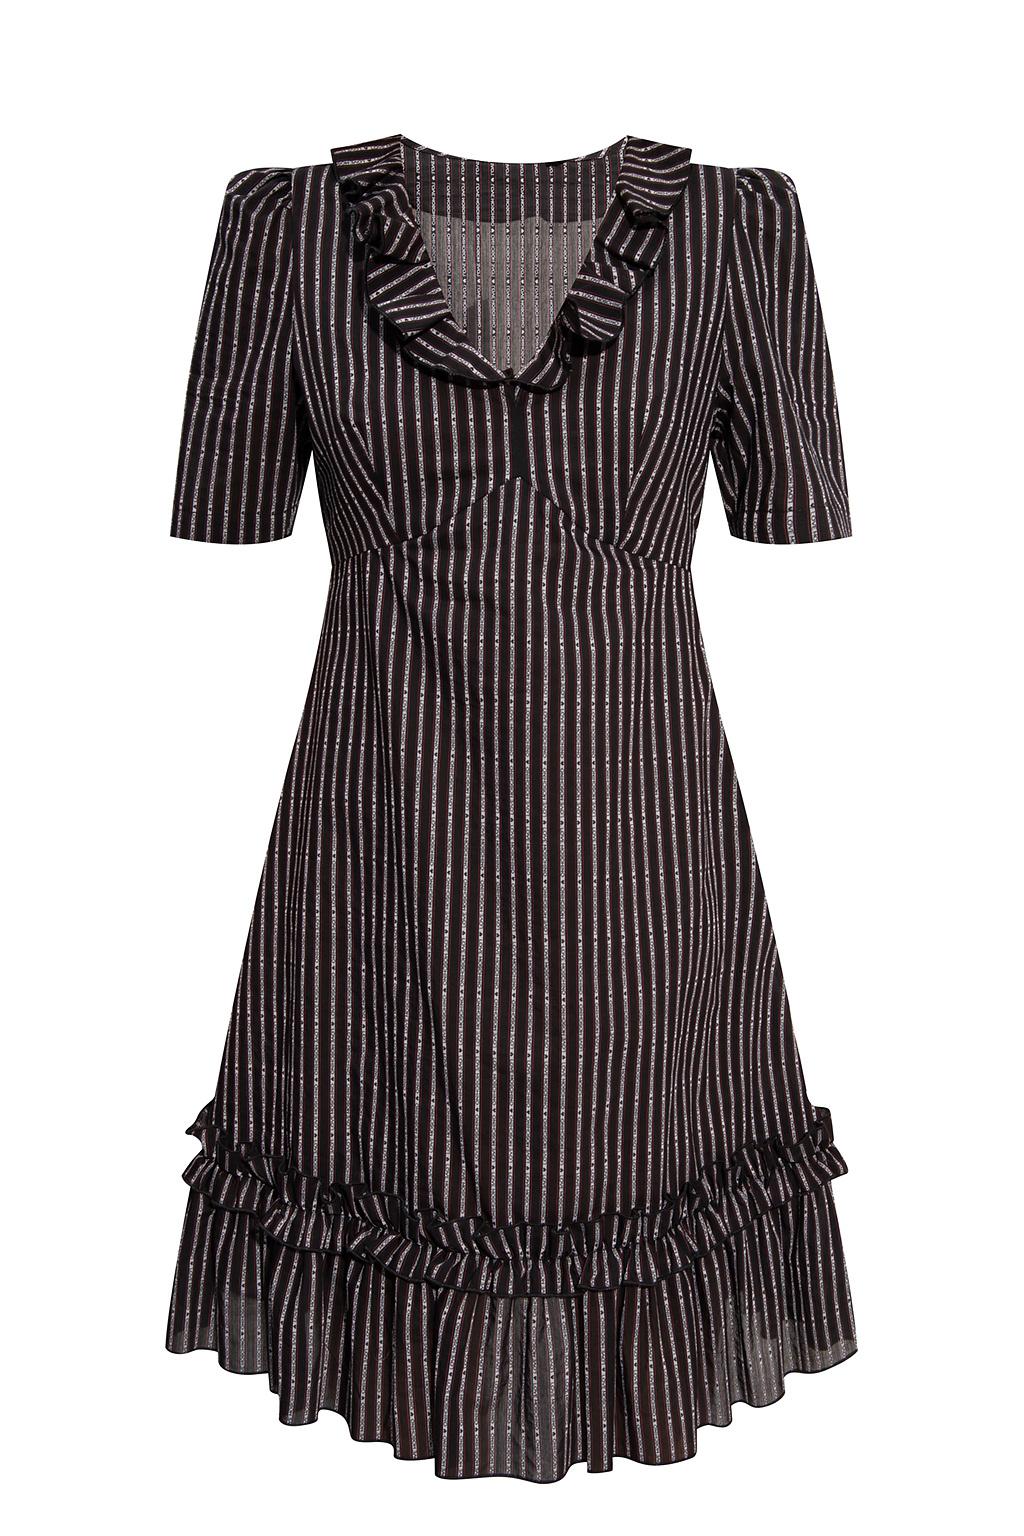 Love Moschino Short-sleeved dress